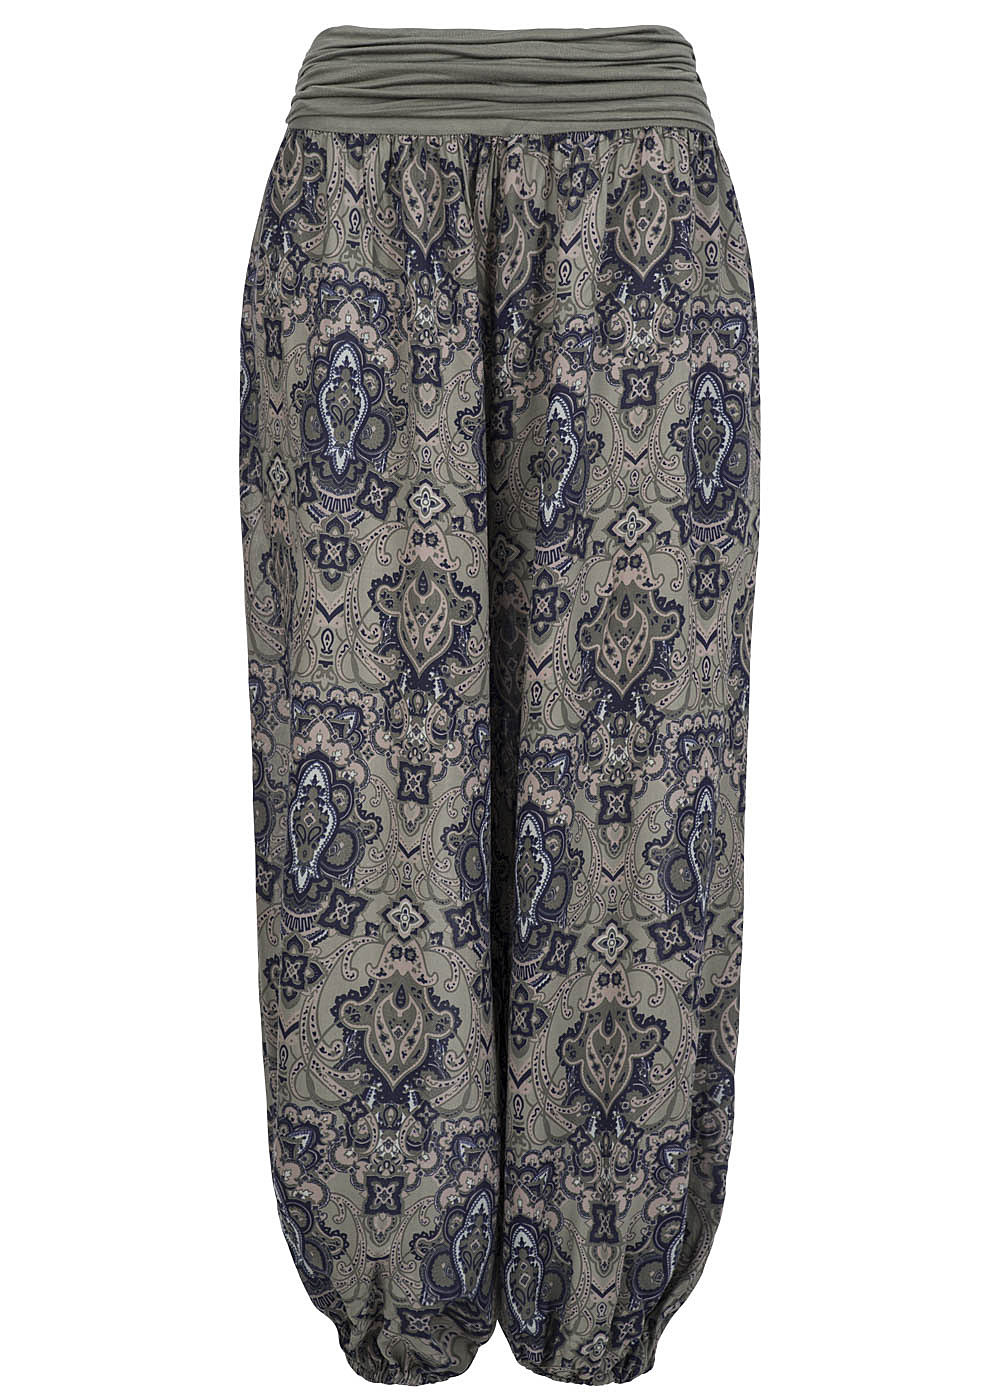 hailys damen sommer hose jasmin am 10968 1 harem style paisley muster khaki blau ebay. Black Bedroom Furniture Sets. Home Design Ideas